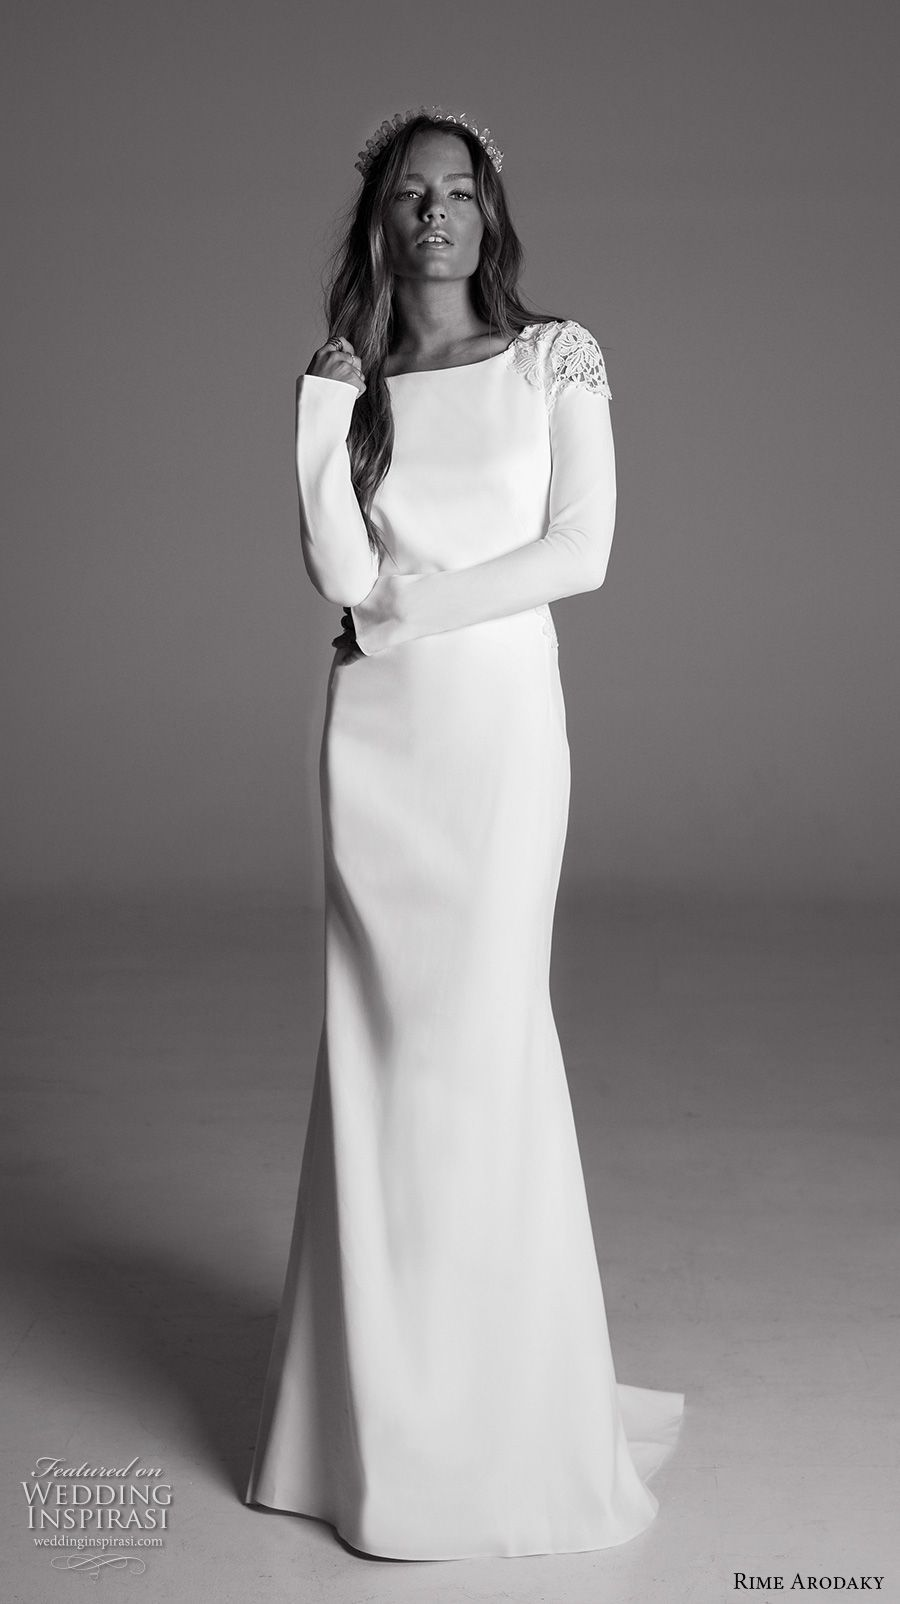 Victoria Soprano 2017 Wedding Dresses Capri Bridal Collection Wedding Inspirasi Wedding Dresses Elegant Classy Party Dress Long Sleeve Classy Wedding Dress [ 1800 x 900 Pixel ]